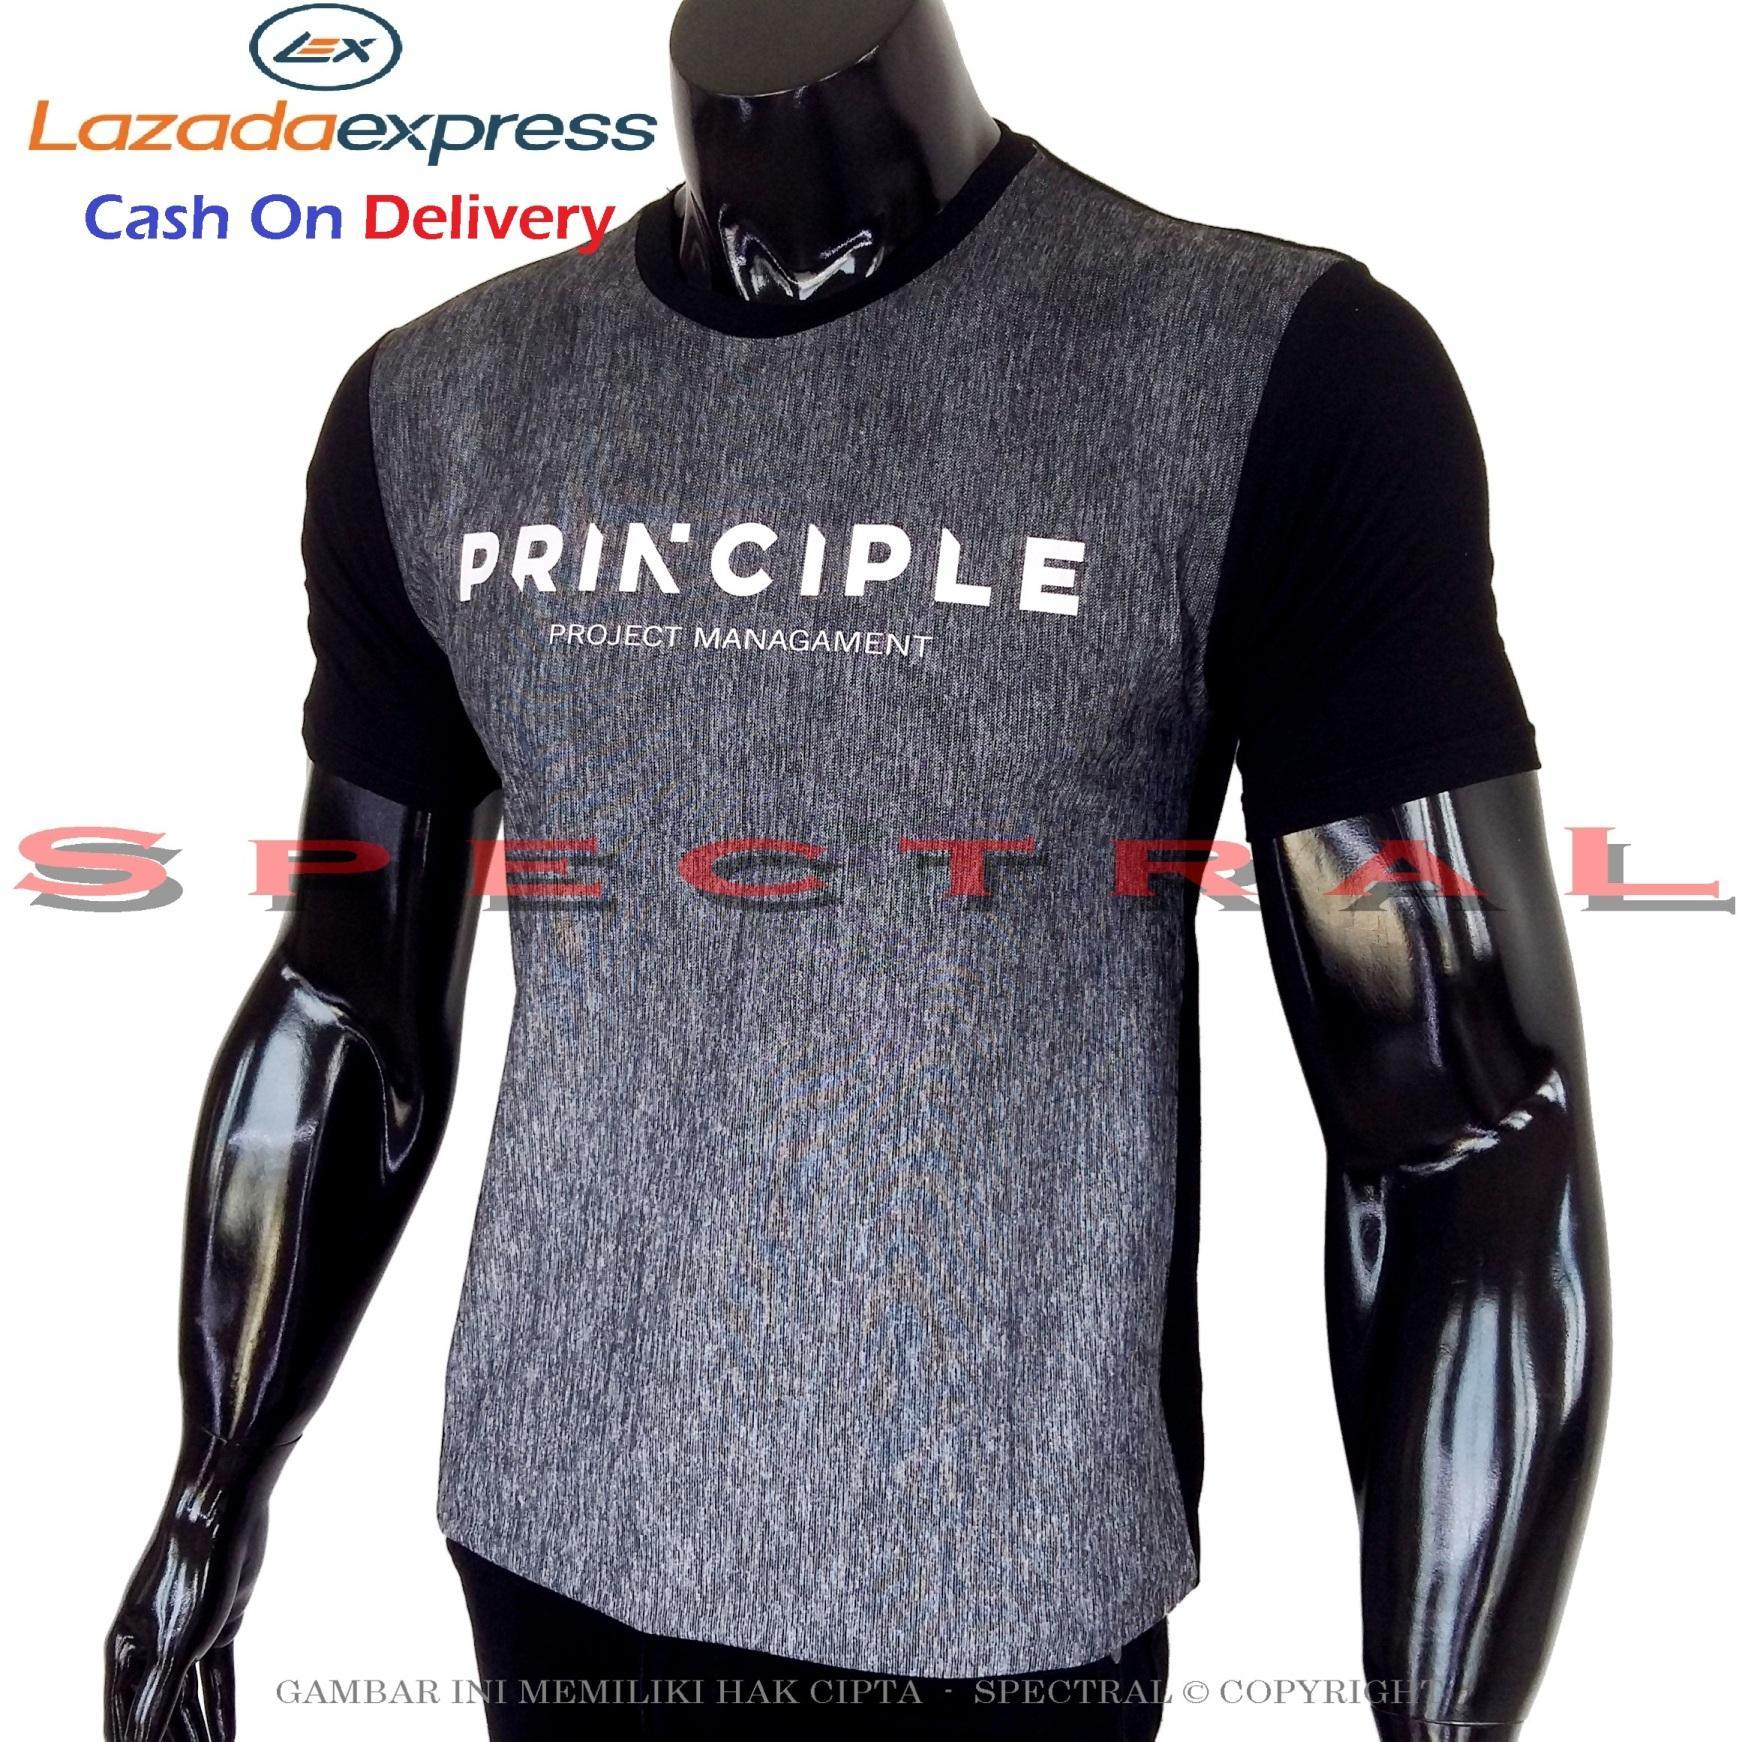 Spectral - Kaos Distro PRINCIPLE Prinsip Soft Rayon Viscose Lycra Pola M Fit To L Simple Fashionabl